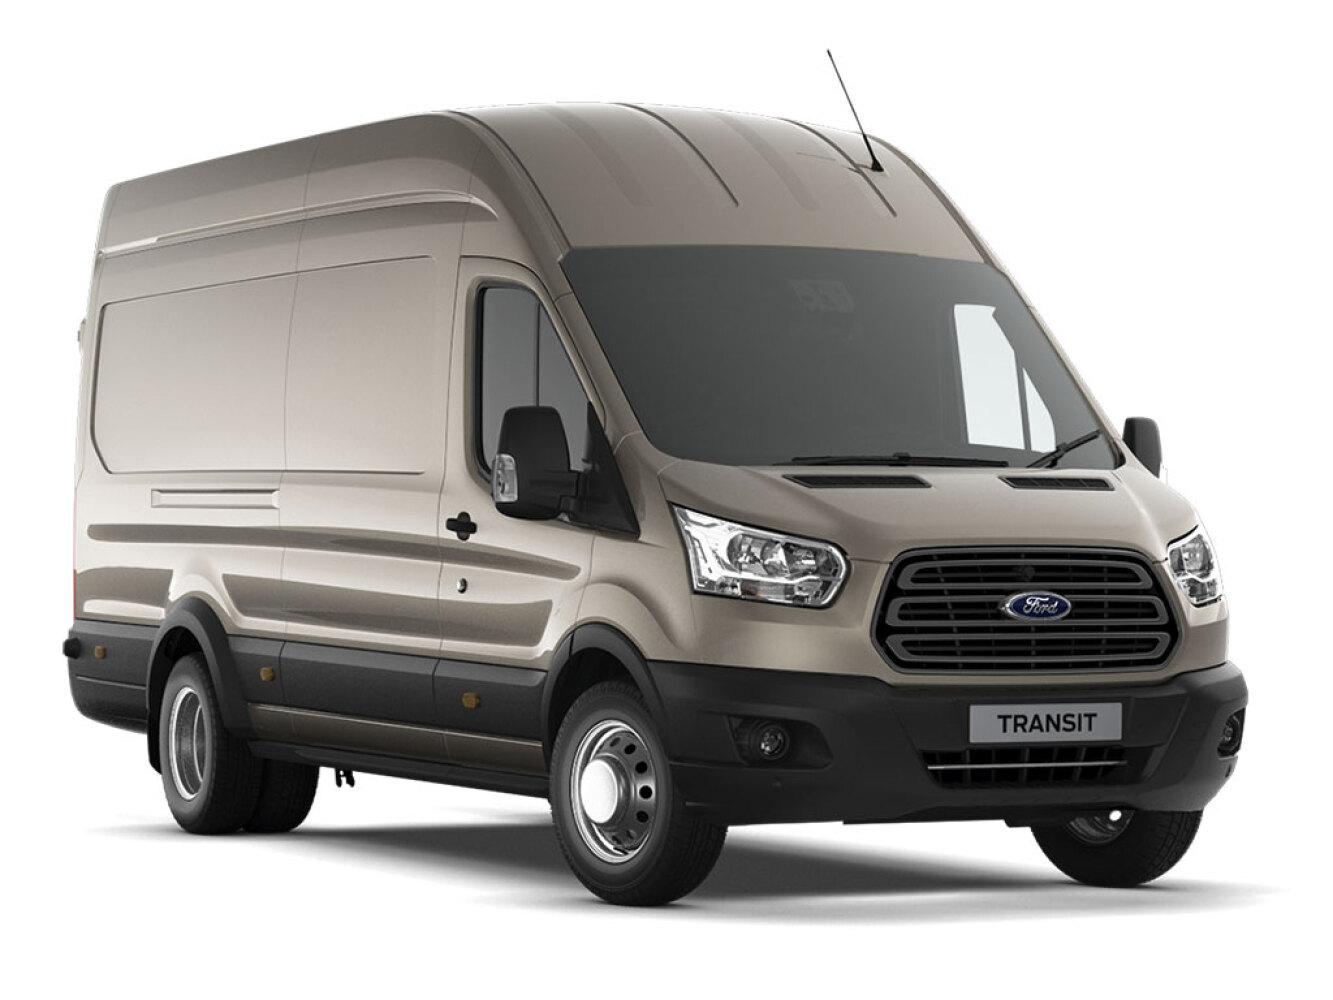 new ford transit 470 l4 diesel rwd 2 0 tdci 130ps h3 van. Black Bedroom Furniture Sets. Home Design Ideas